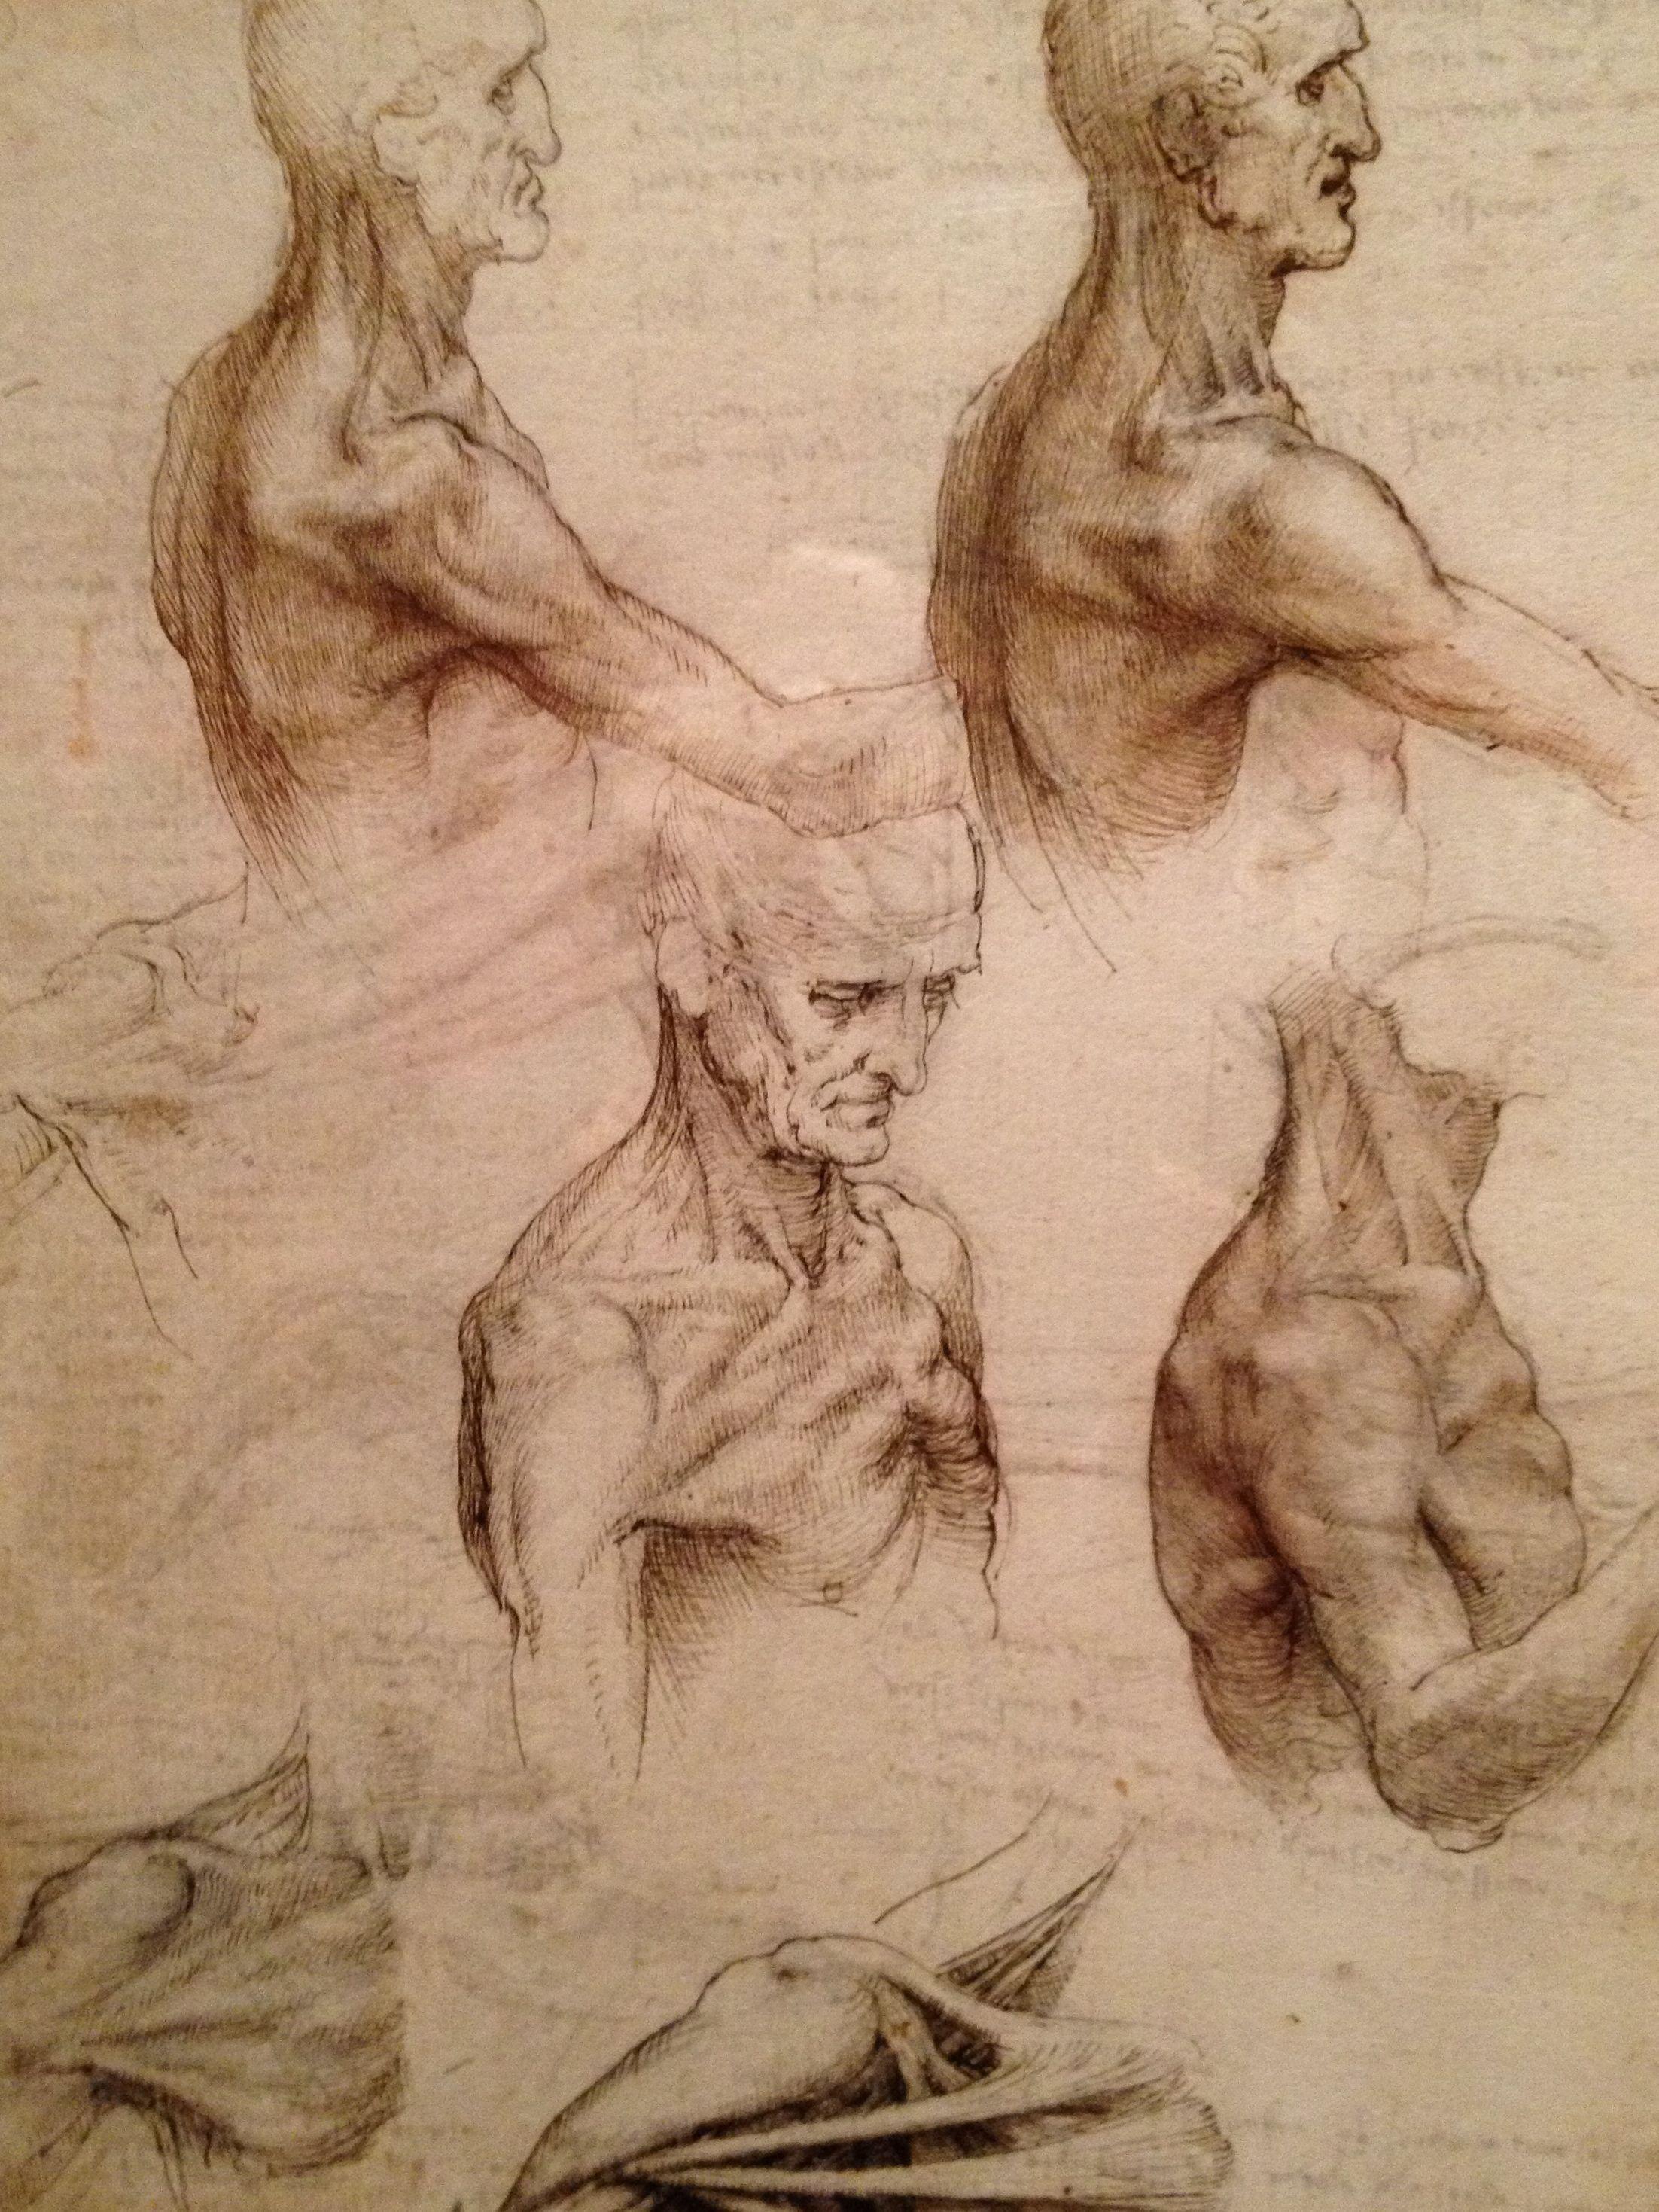 Leonardo Da Vinci Anatomist He Loved The Study Of The Human Body